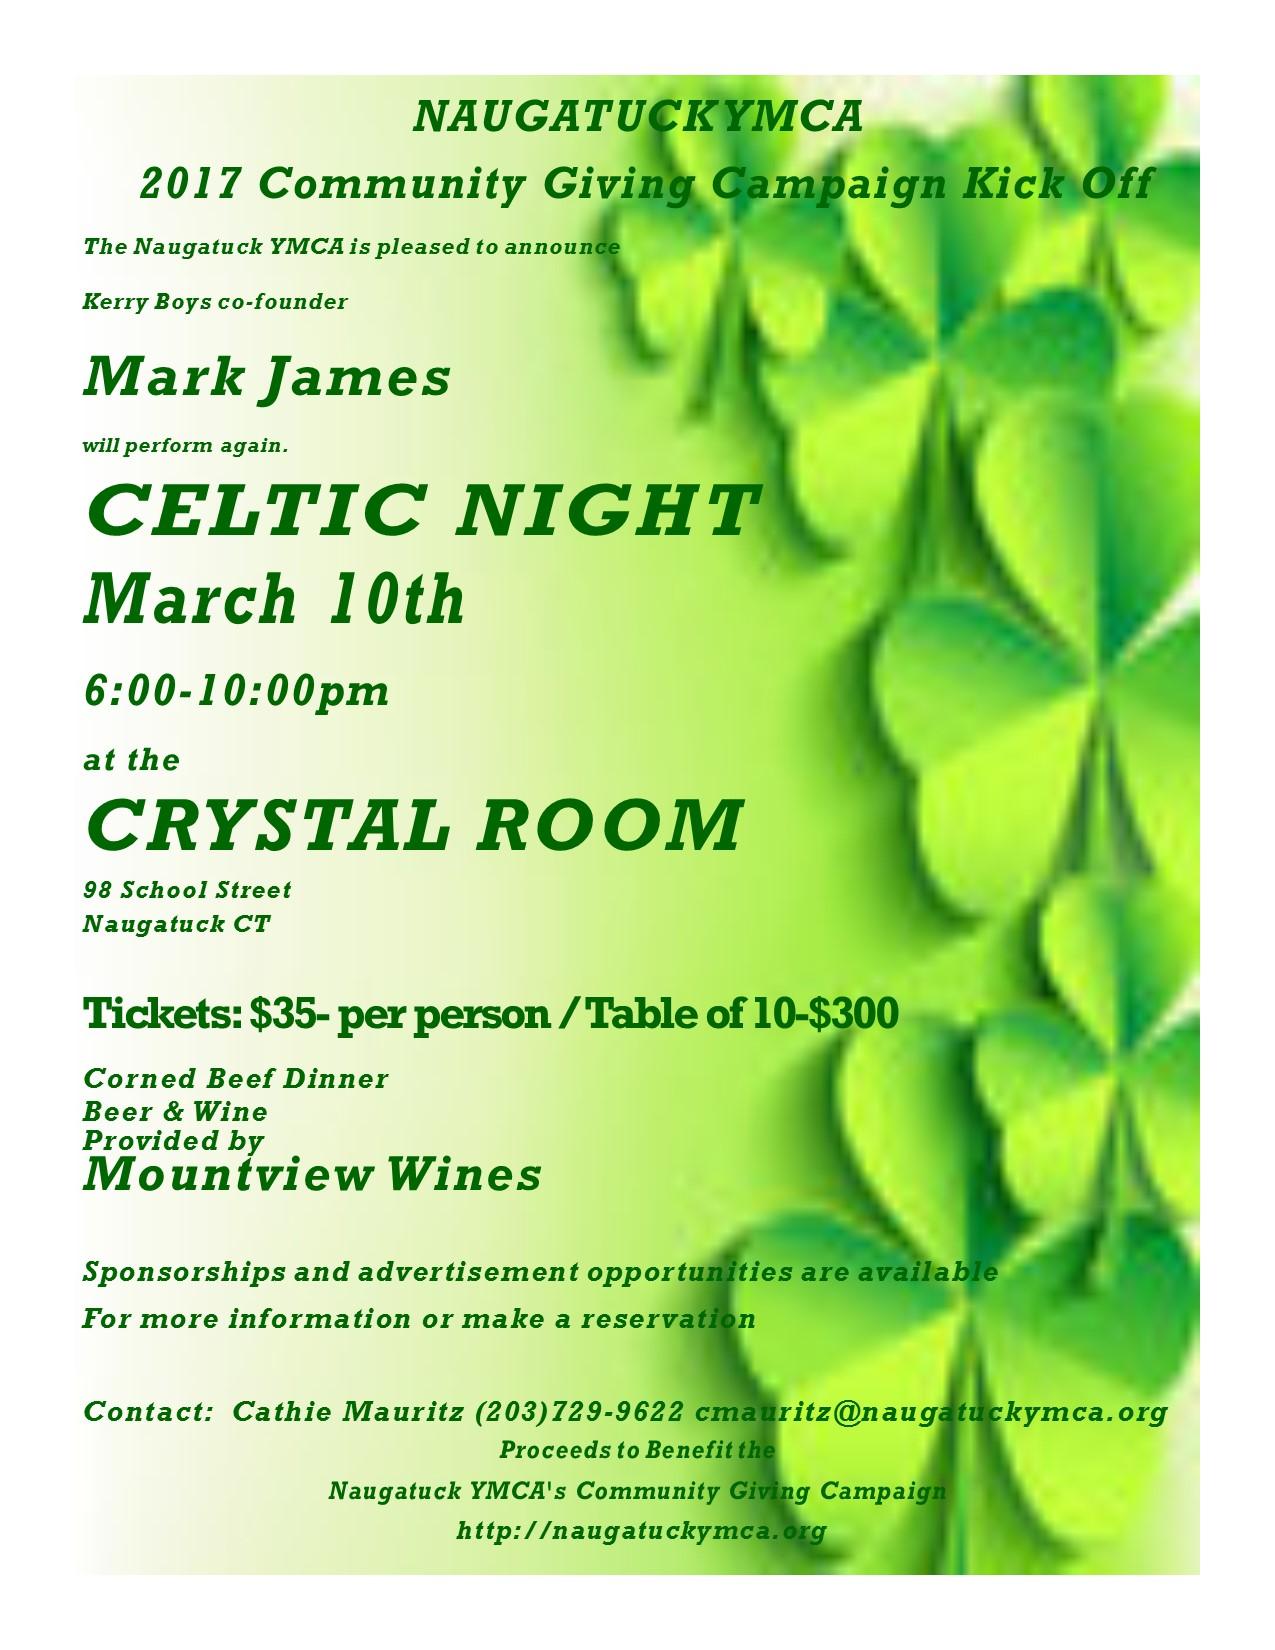 Celtic Night @ The Crystal Room